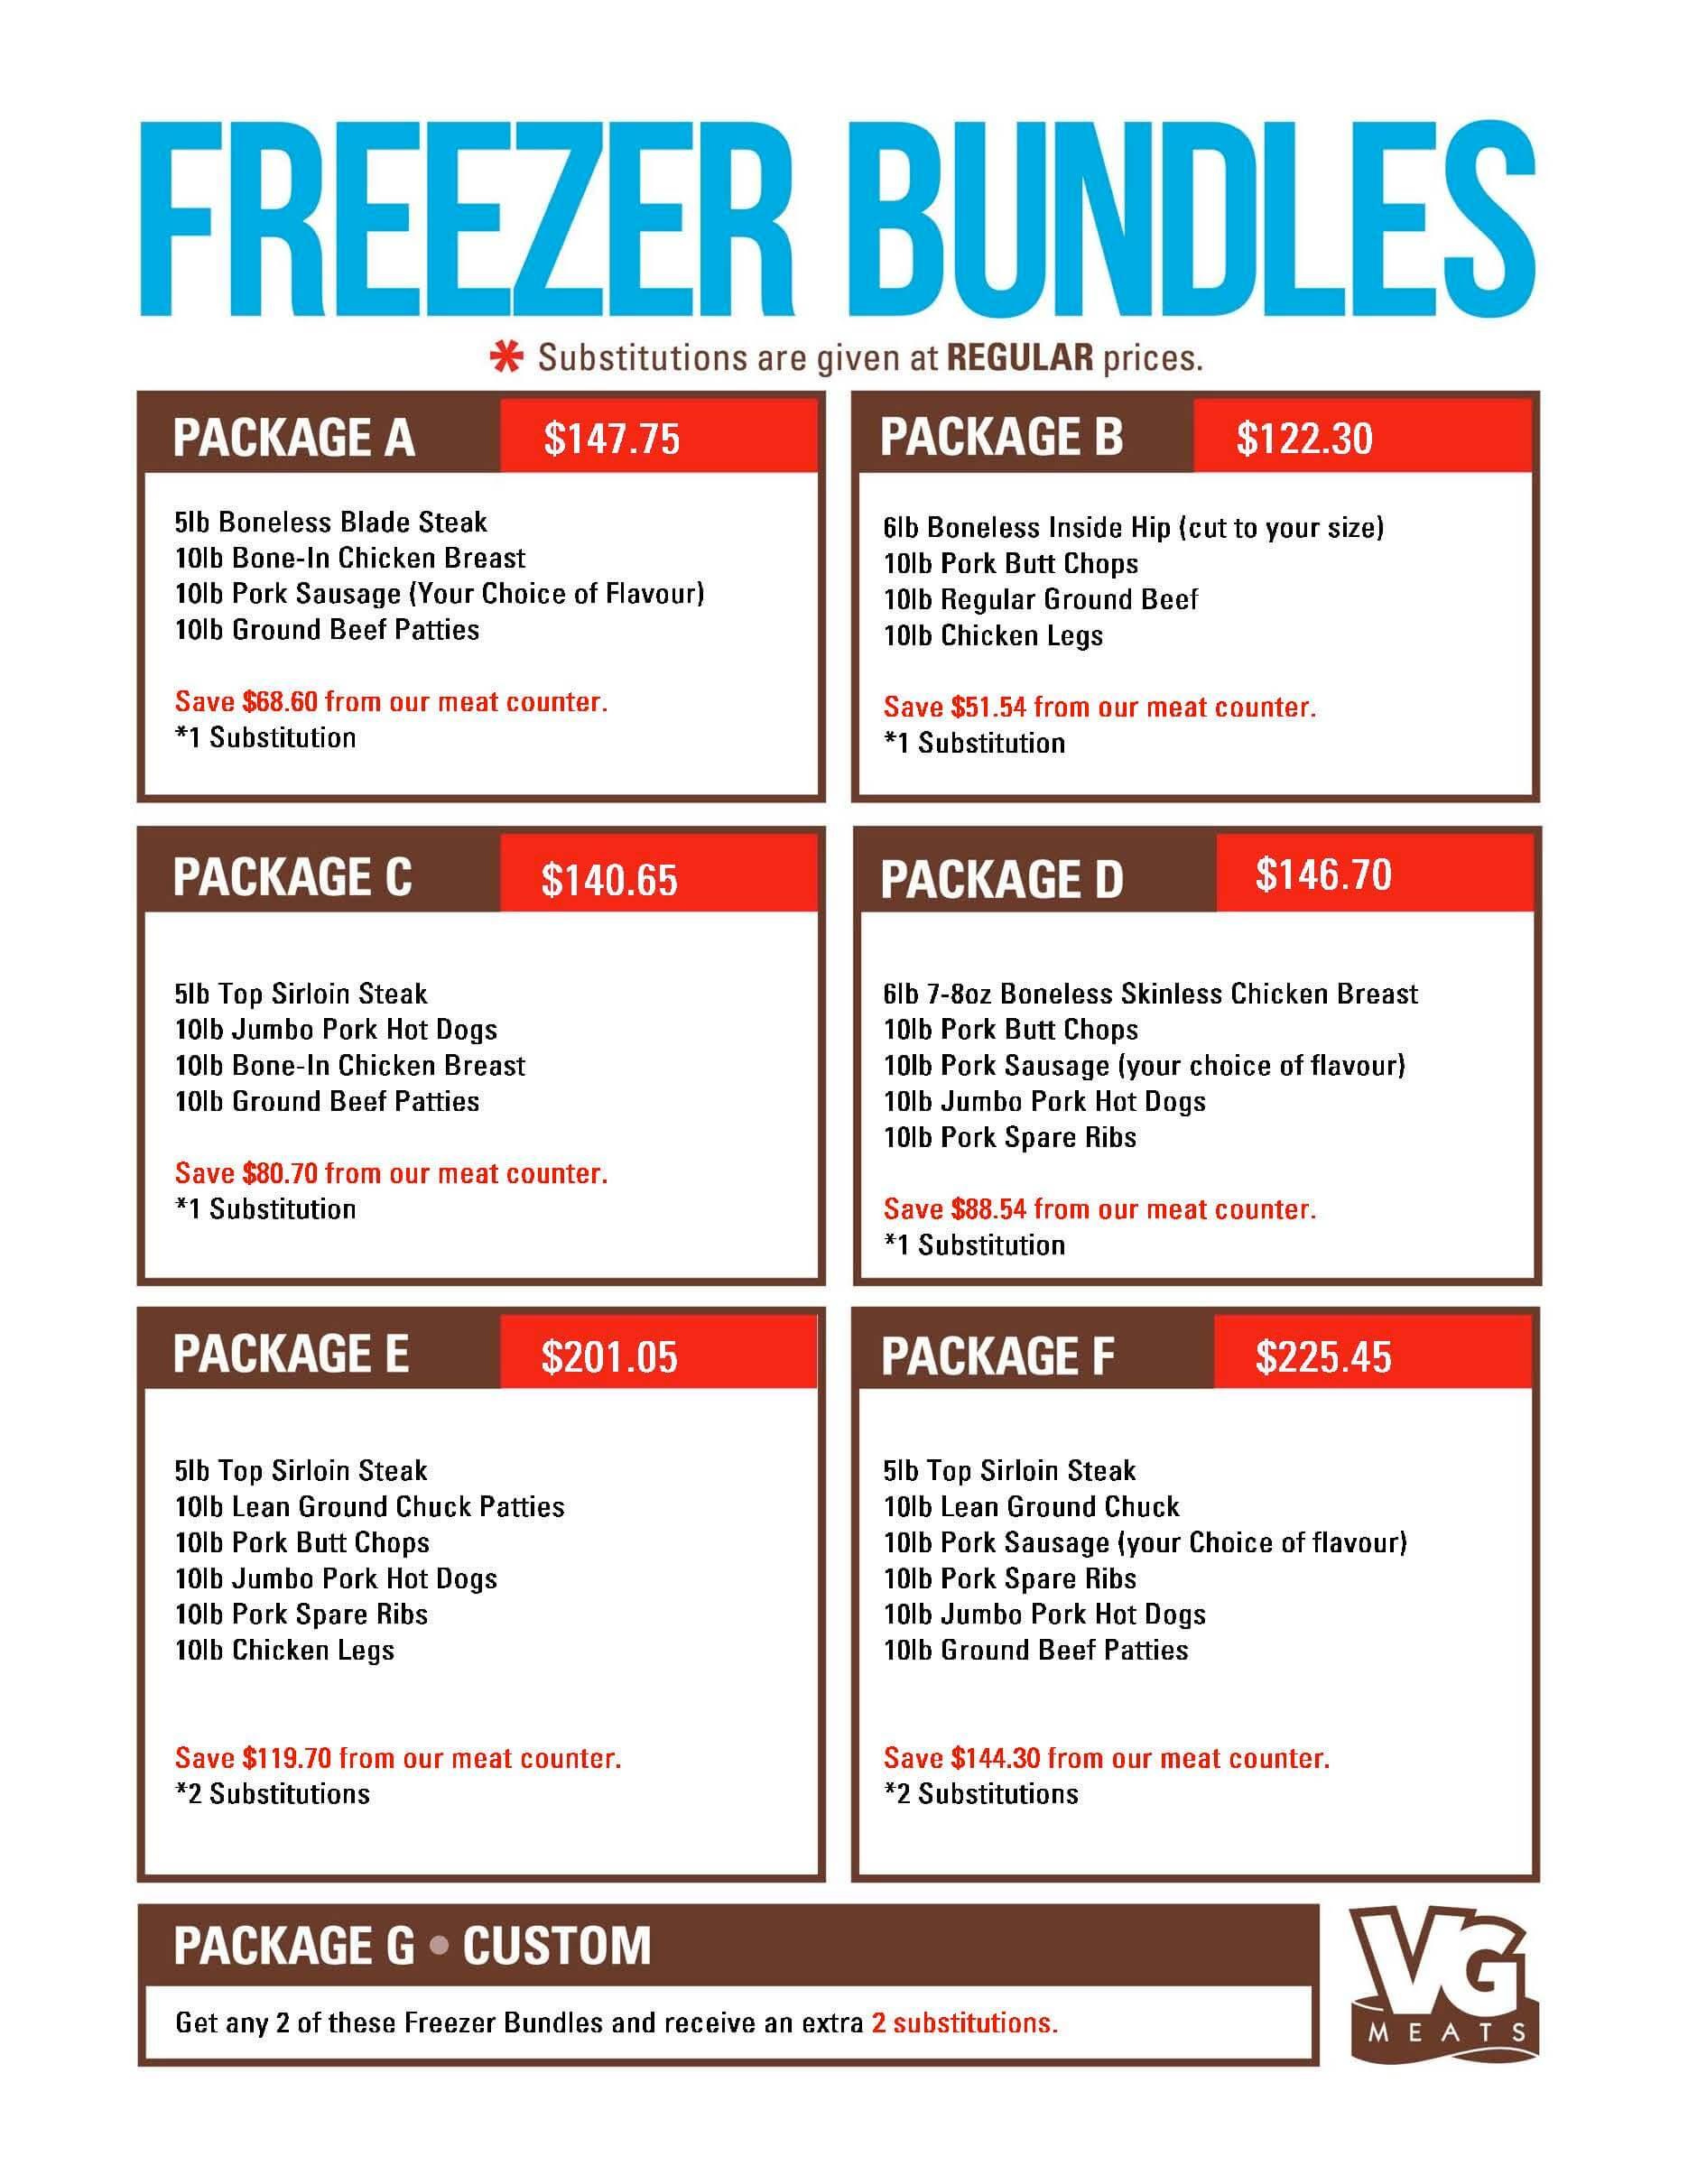 June 15 Freezer Bundles